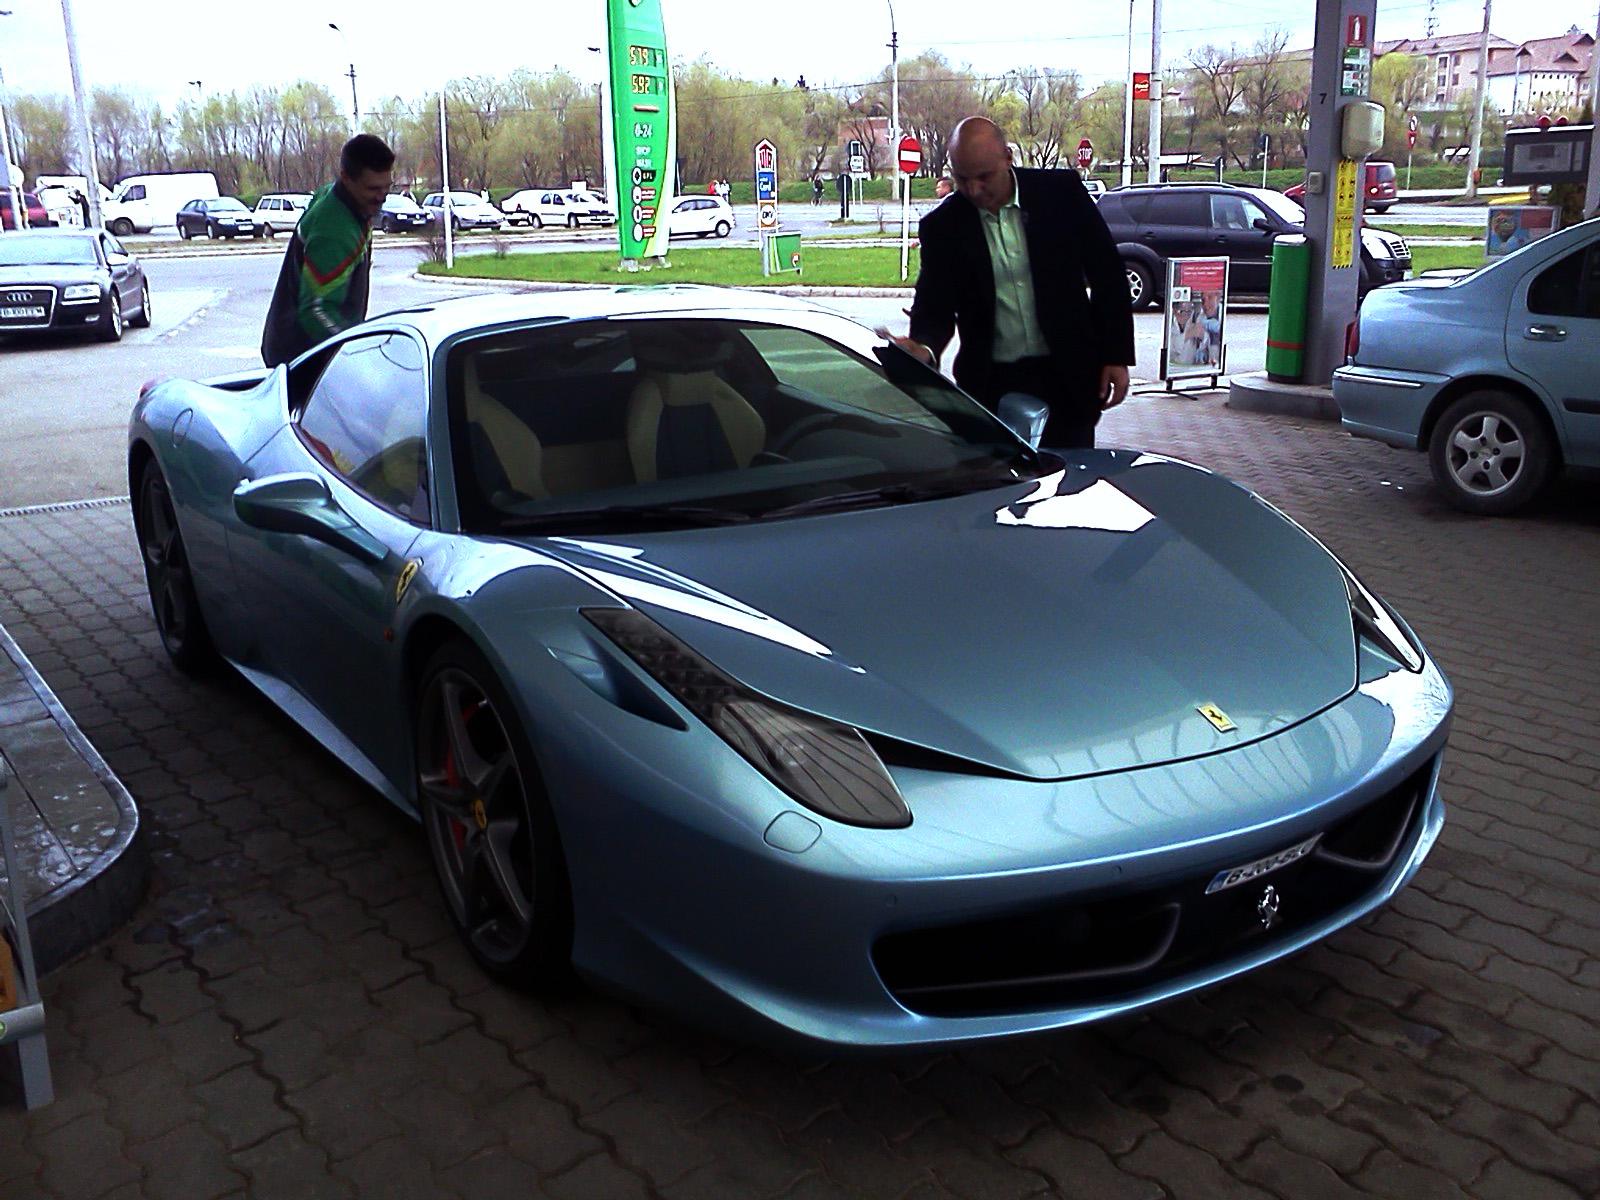 video blue ferrari 458 italia spotted in romania - Ferrari 458 Italia Blue